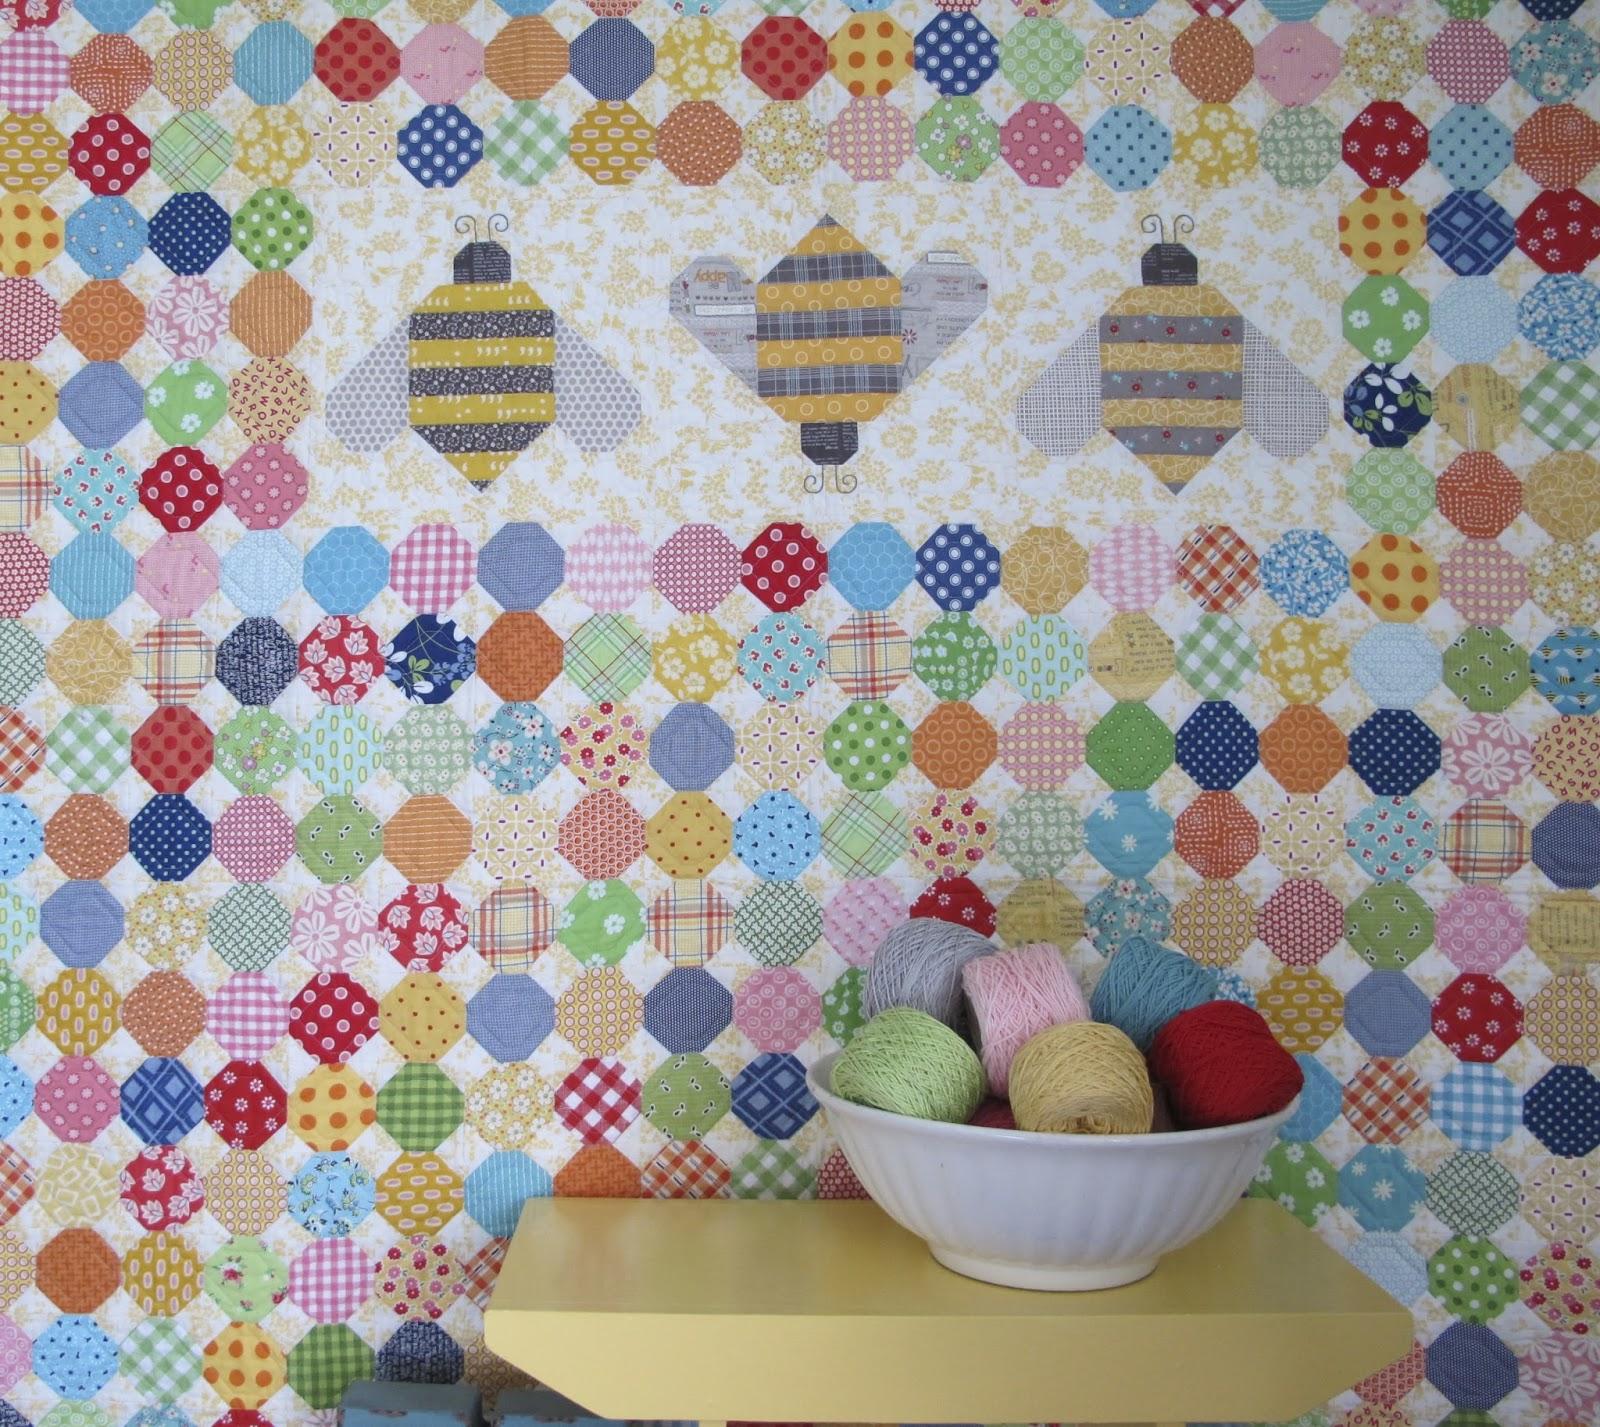 The Quilty Fun Sew Along - Week 11 - Honeycombs!!! ...